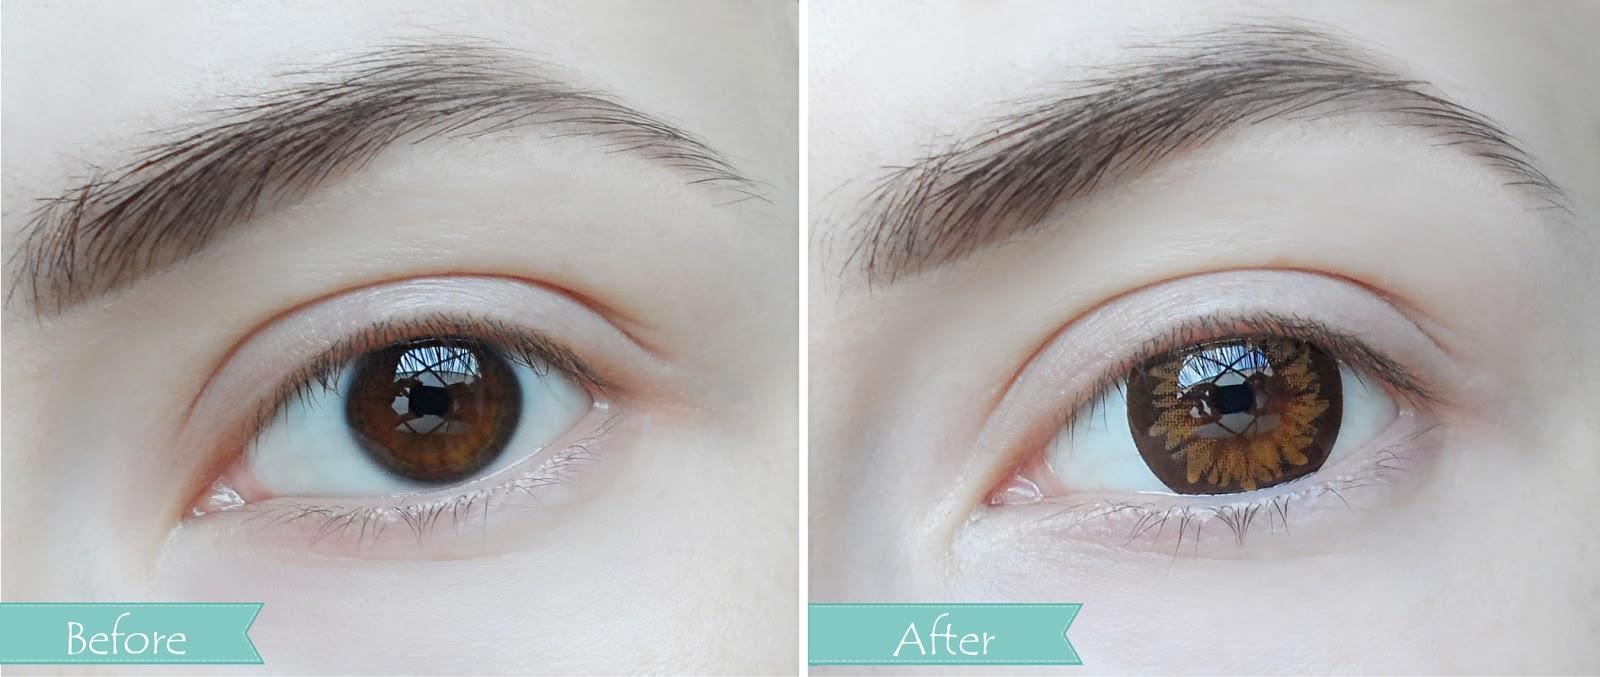 Magic - Eye Easel Contact Lens by Klenspop | January Girl